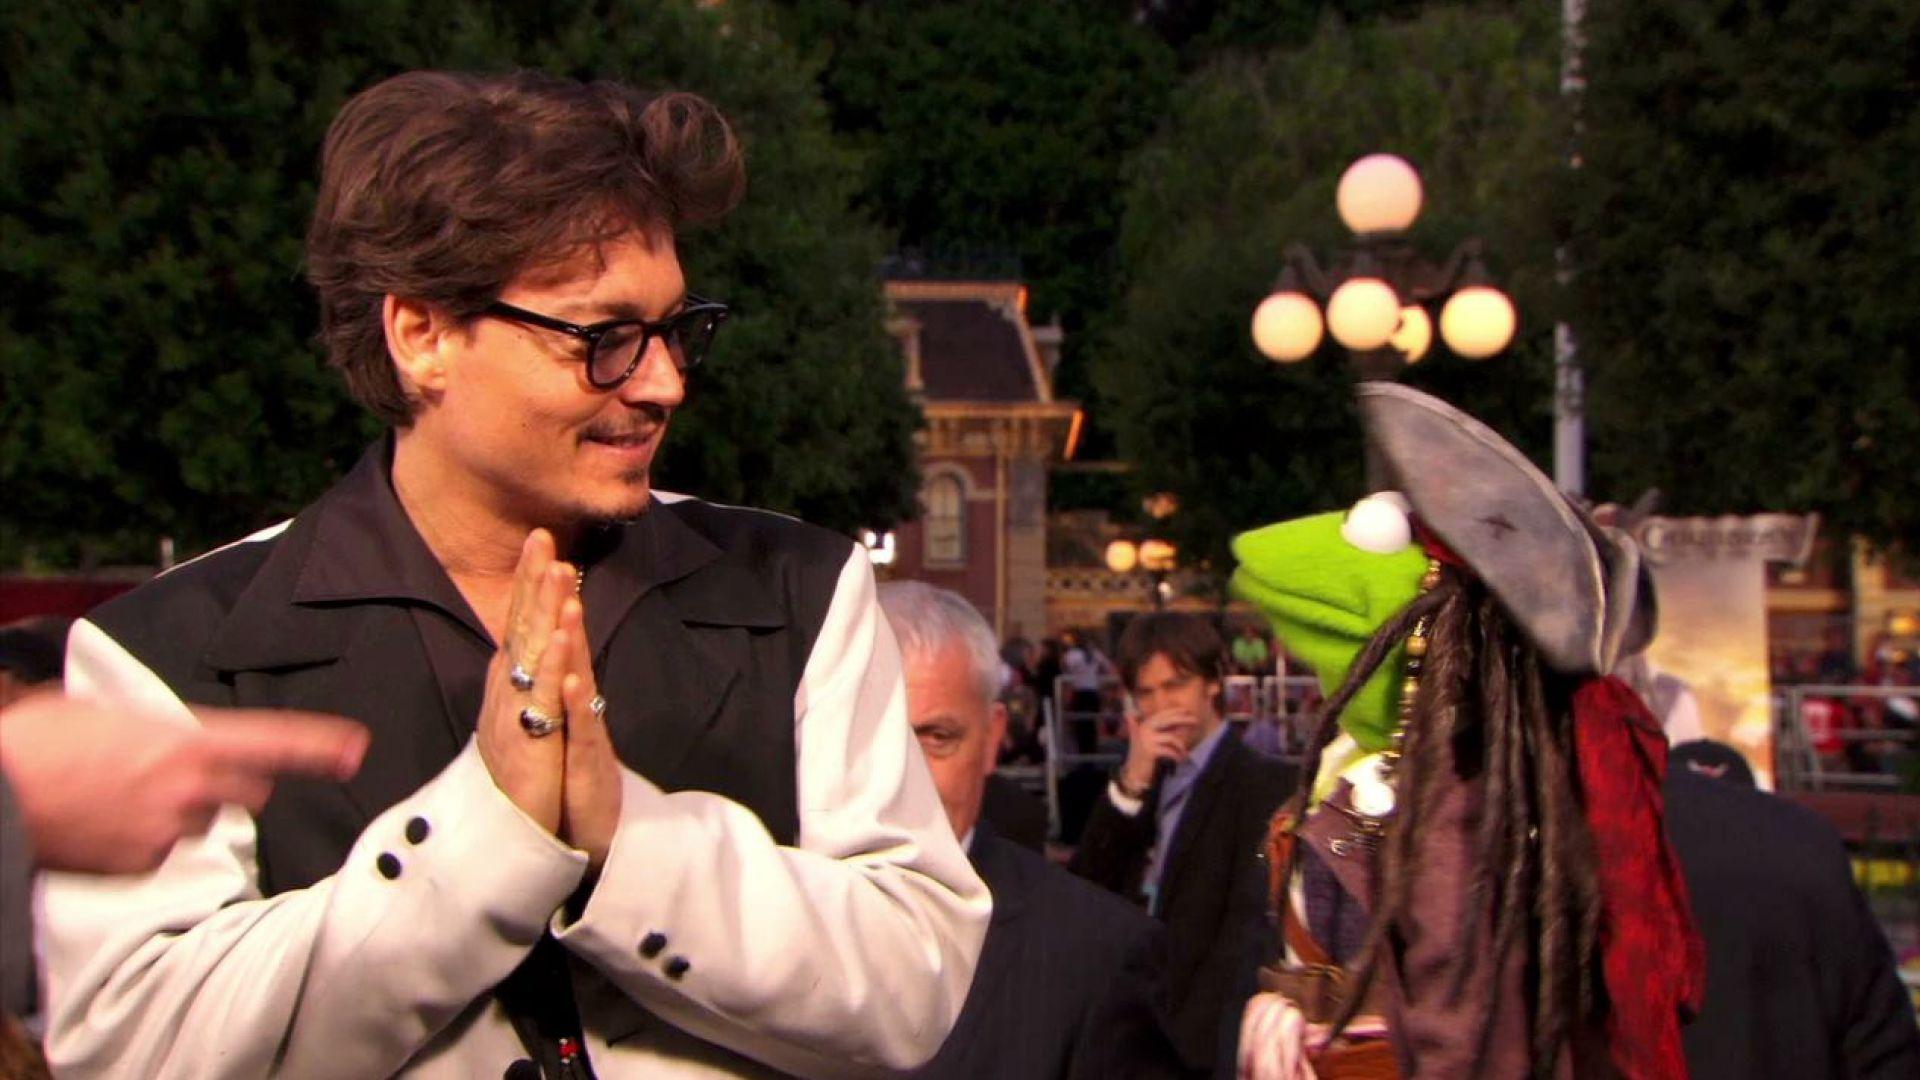 Kermit interviews Pirates of the Caribbean 4 cast at Disneyland Premiere